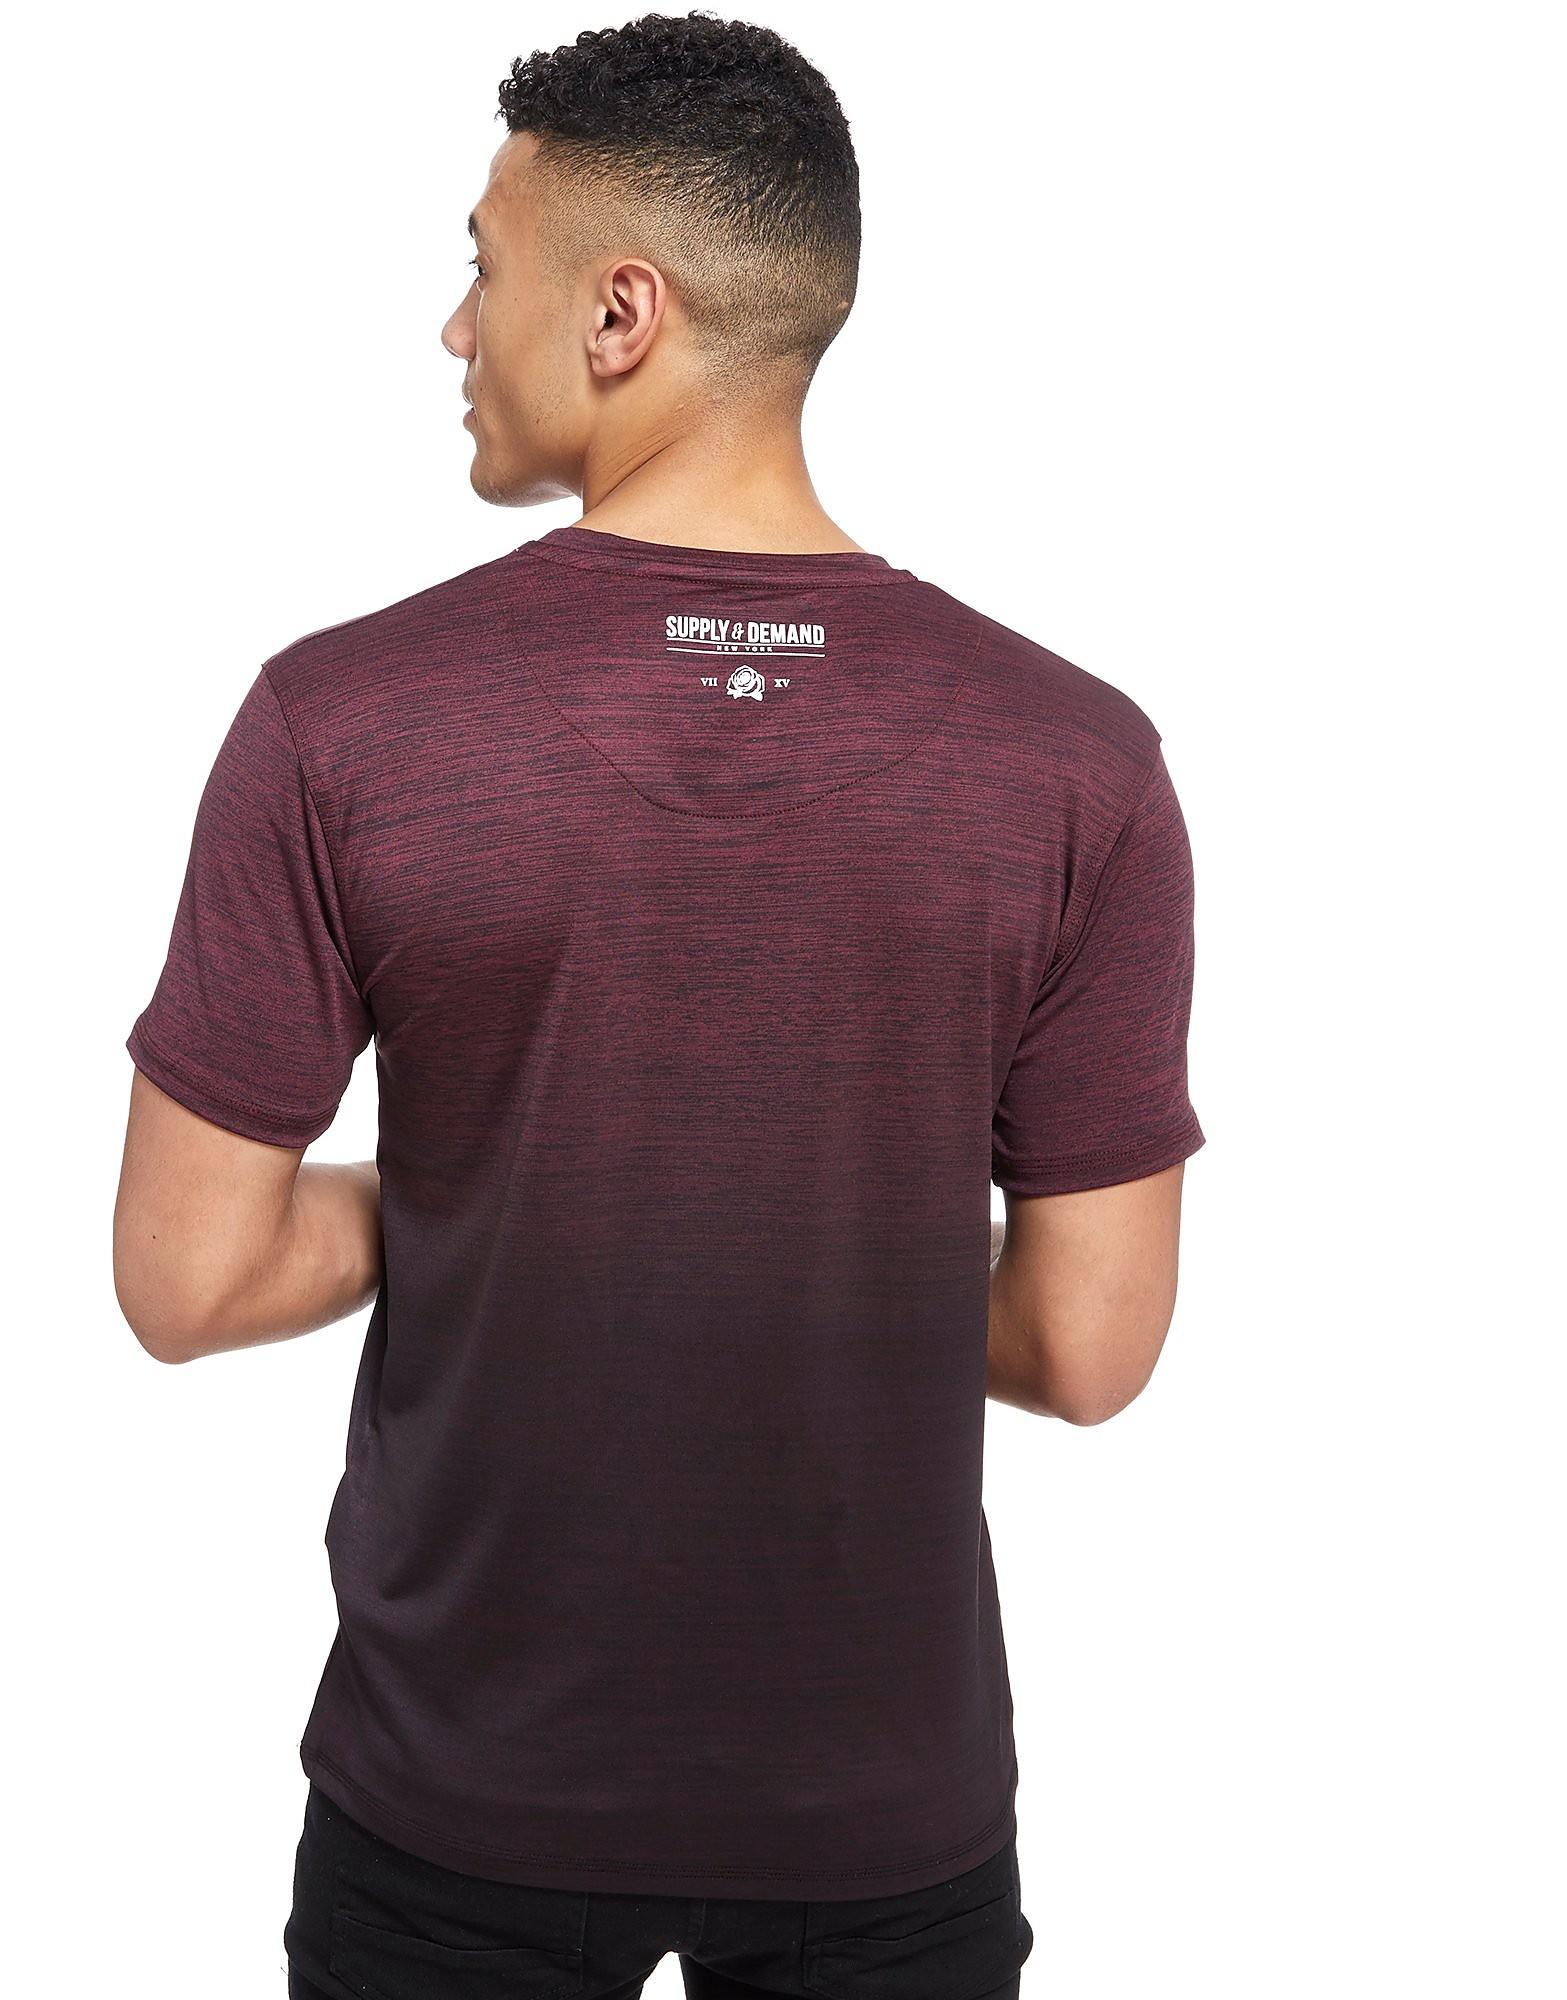 Supply & Demand camiseta Hendrick Fade